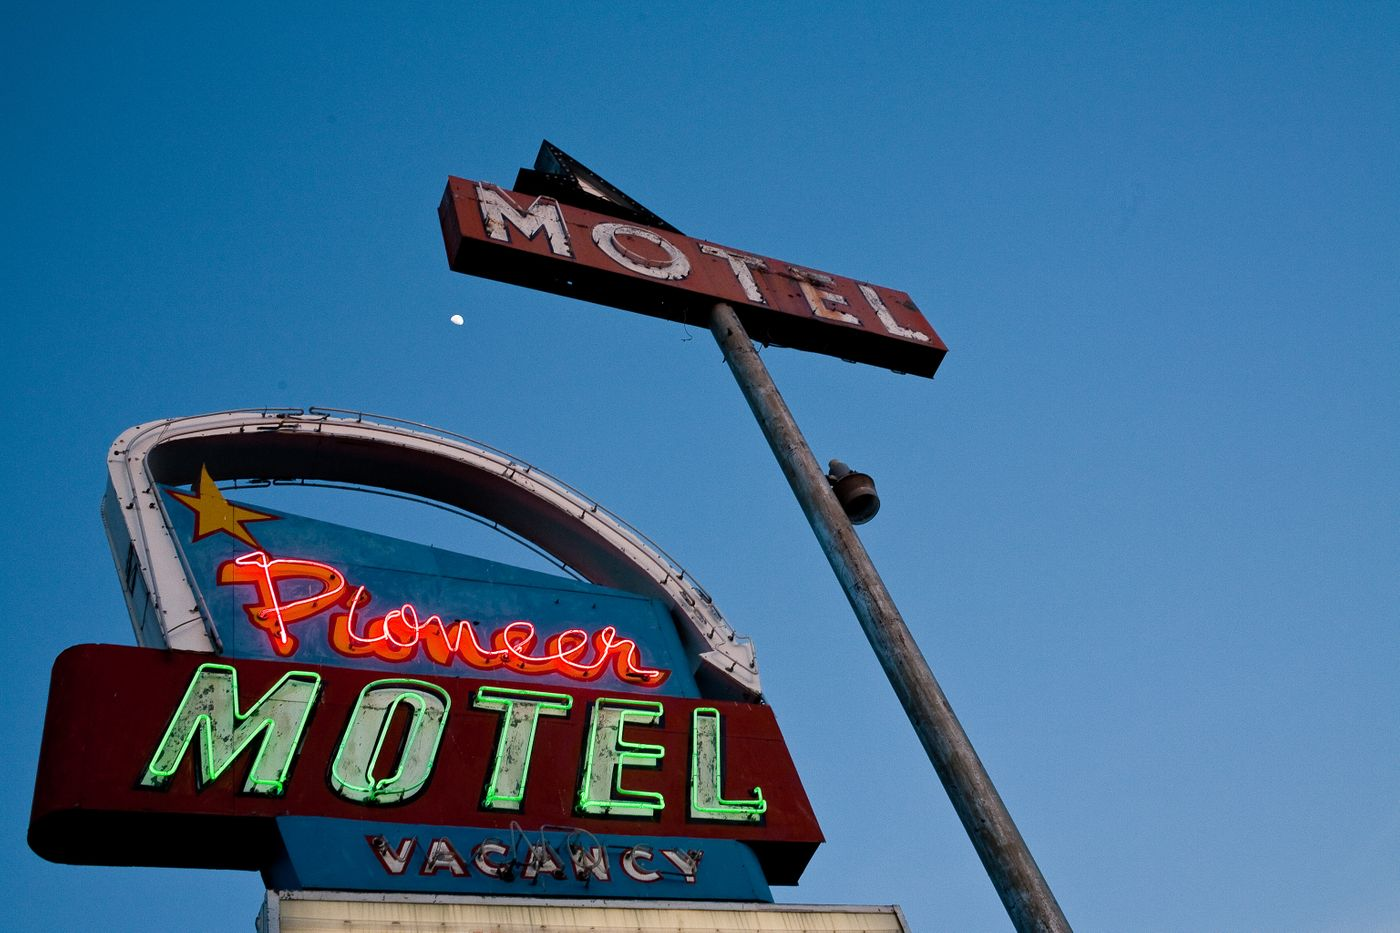 motel-web-2020-jpg-6-PRINT.jpg